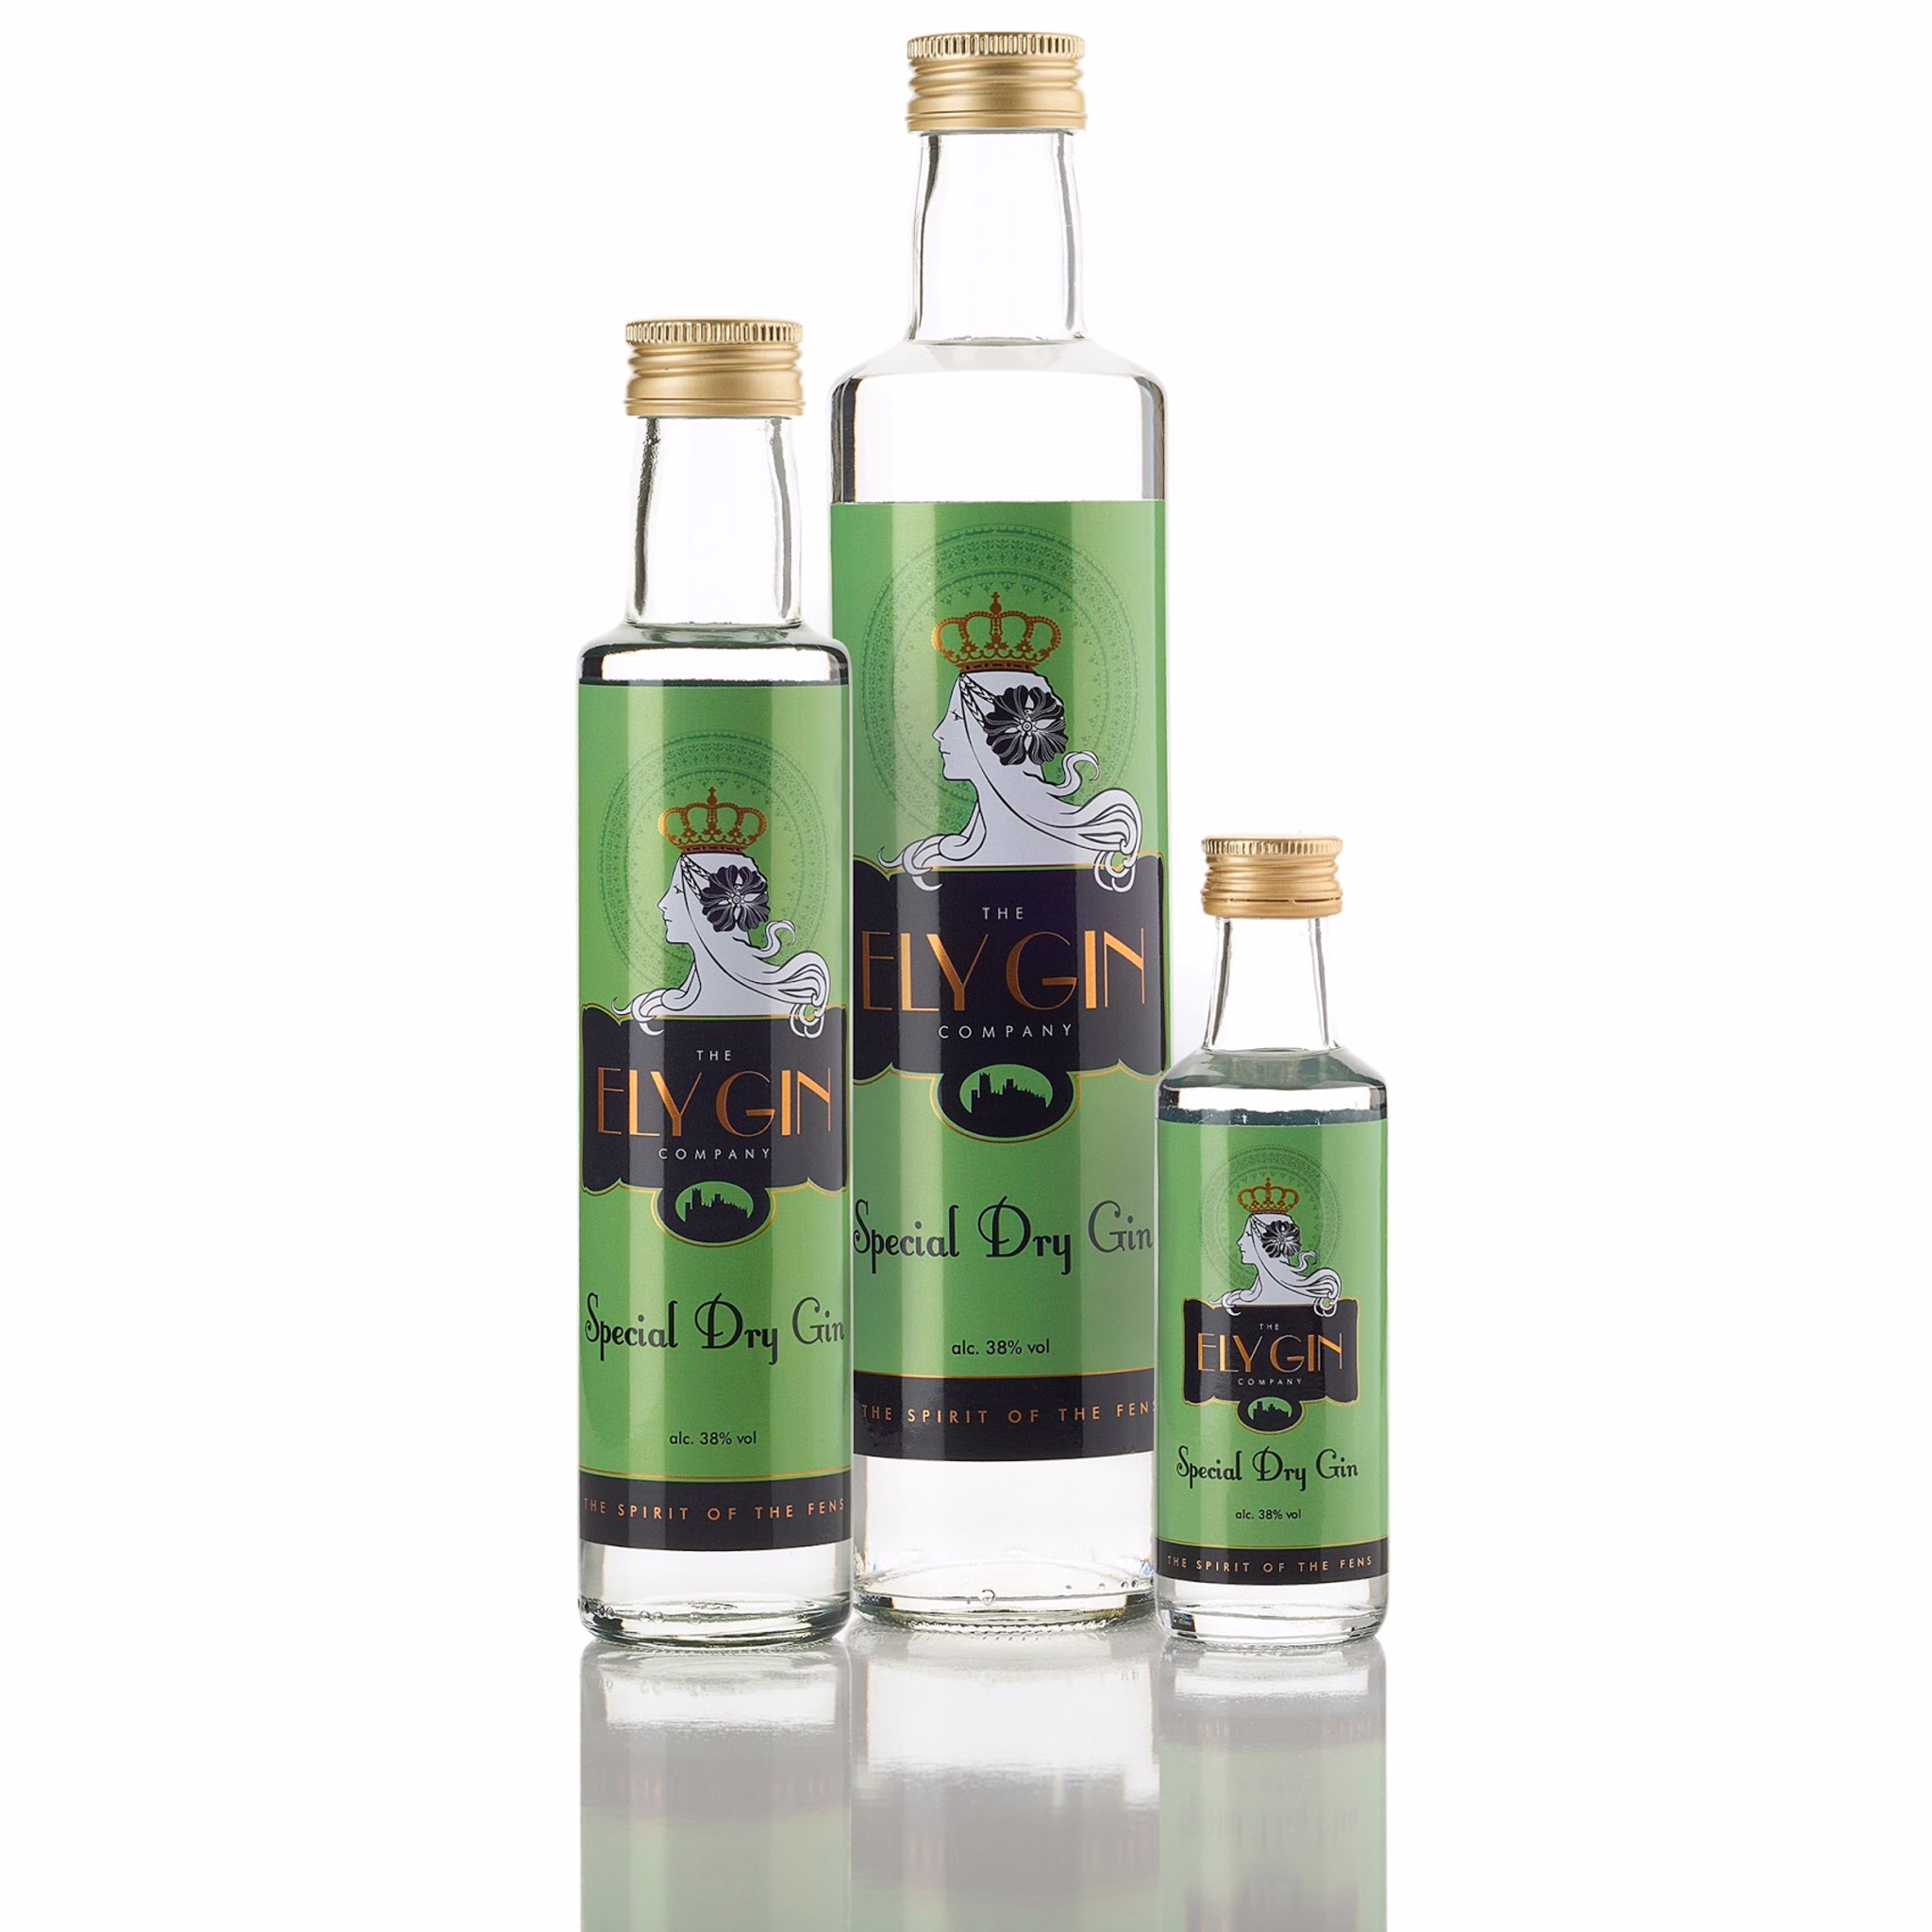 Ely London Dry Gin 38% 100ml, 250ml & 500ml